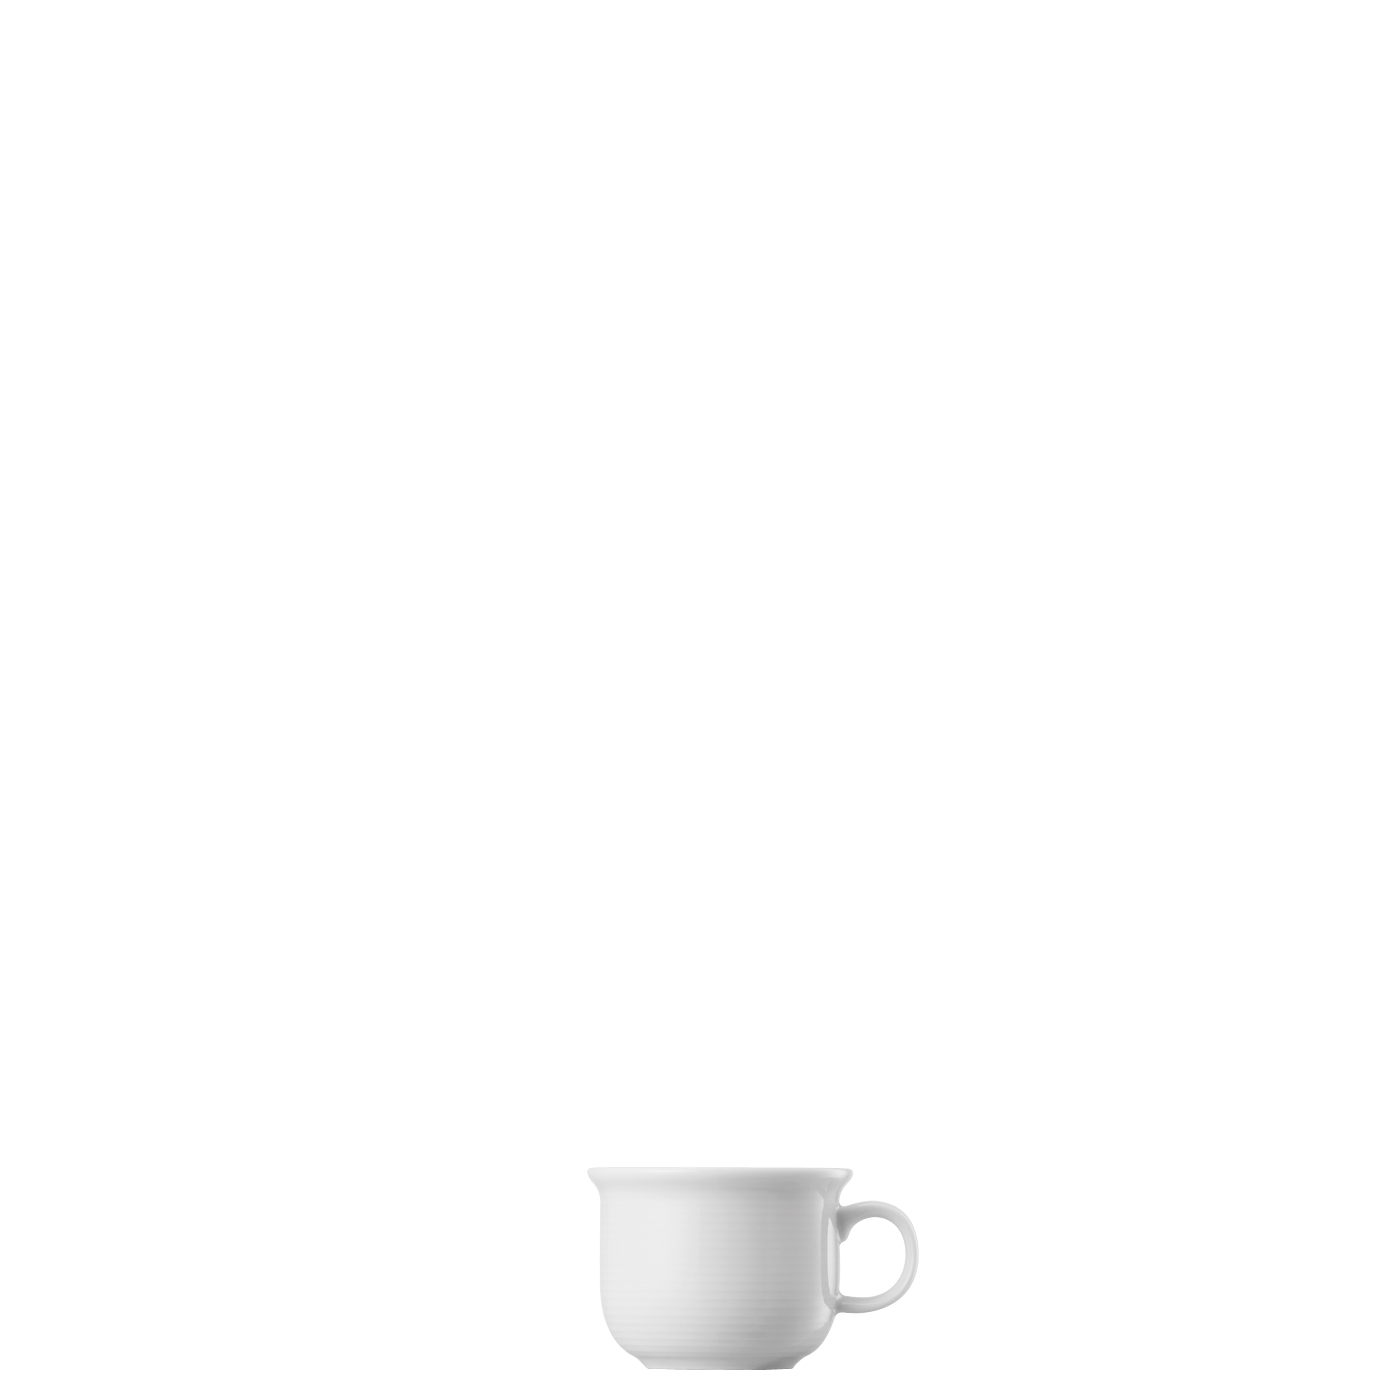 Espresso-Obertasse Trend Weiss Thomas Porzellan